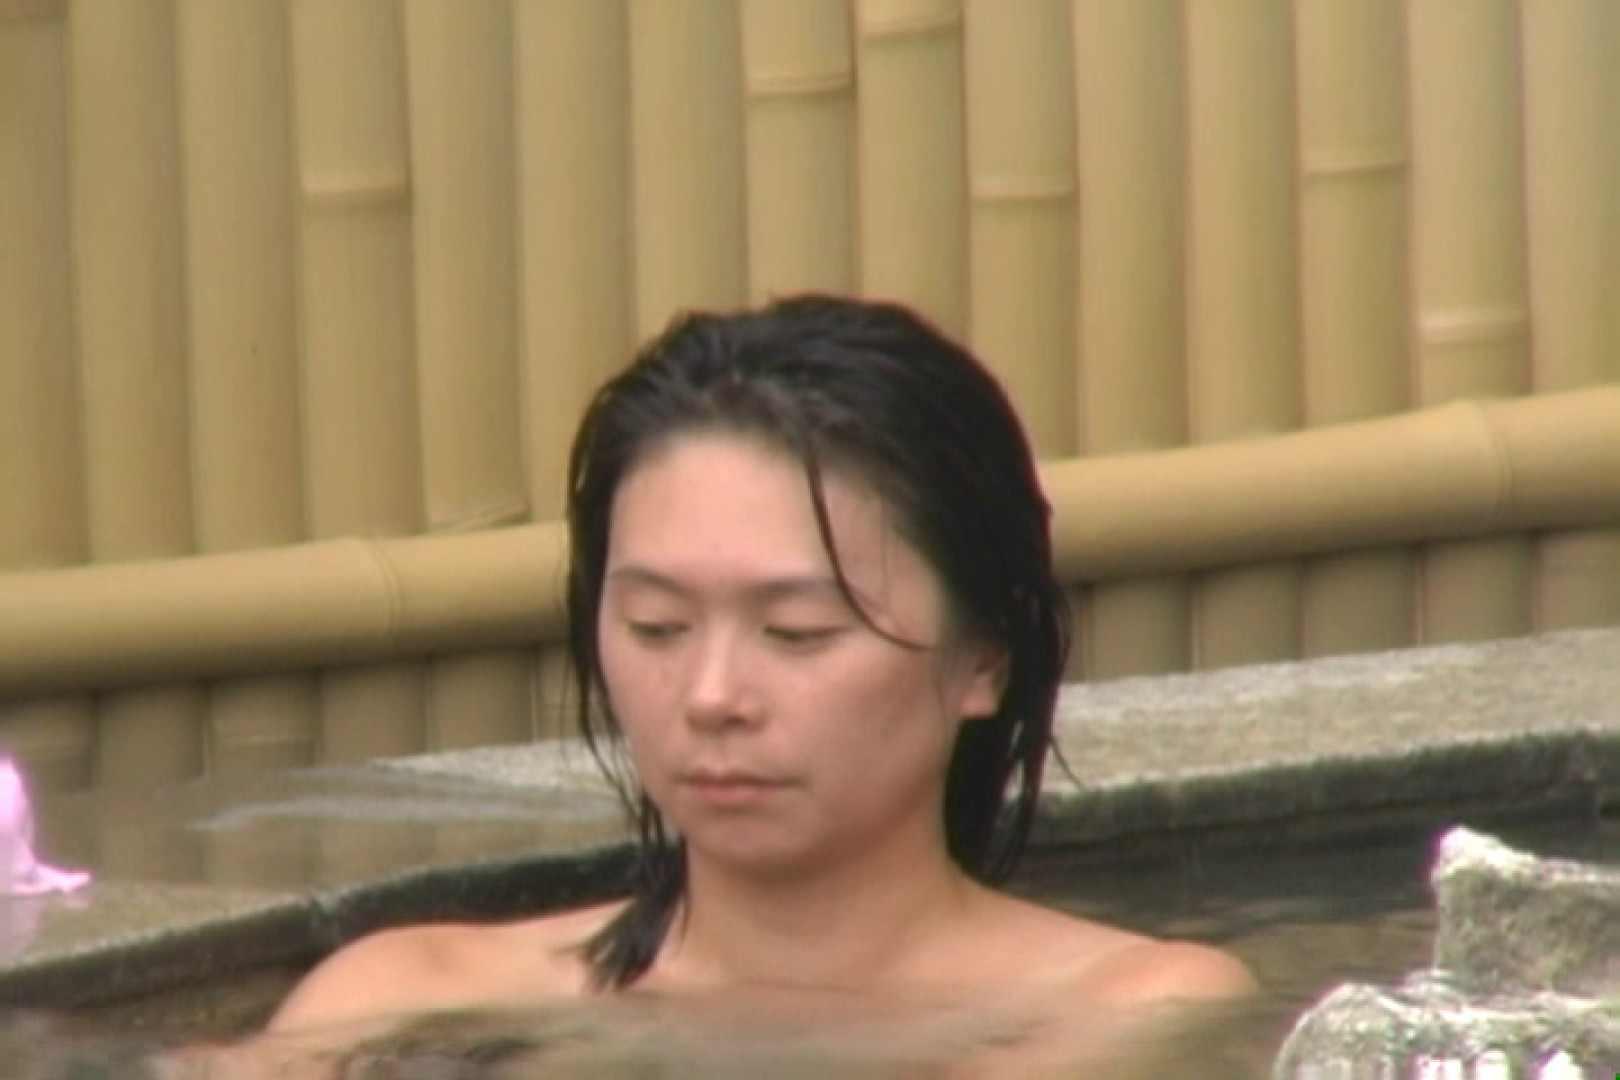 Aquaな露天風呂Vol.619 エッチな盗撮 ワレメ無修正動画無料 107pic 3